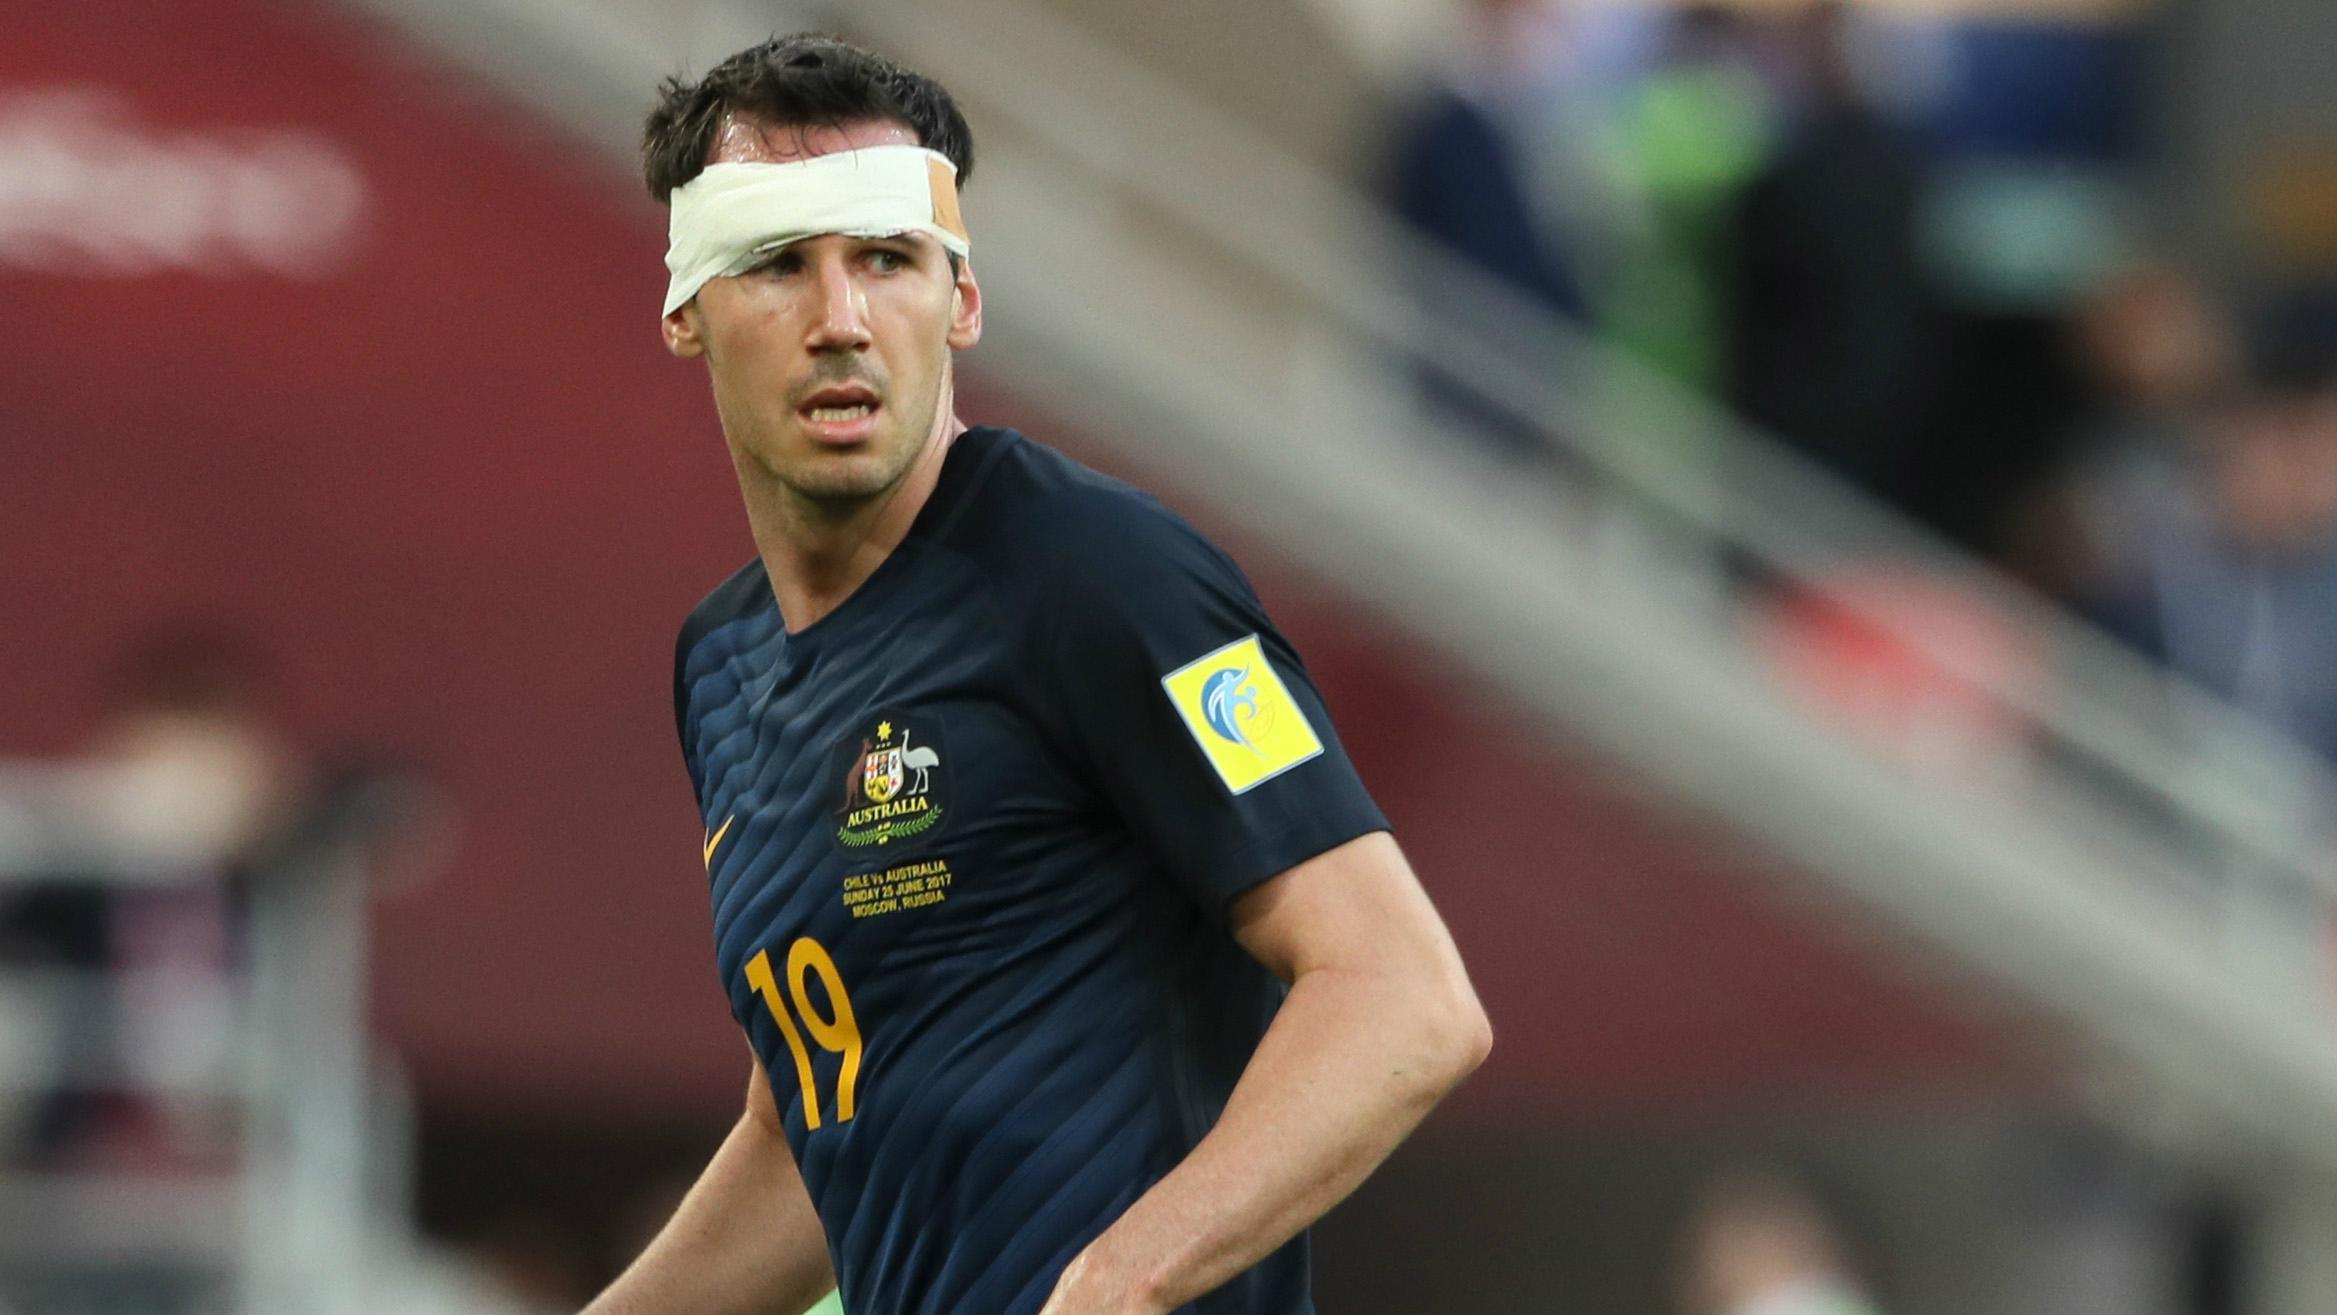 Caltex Socceroos defender Ryan McGowan has signed with UAE club Sharjah FC.